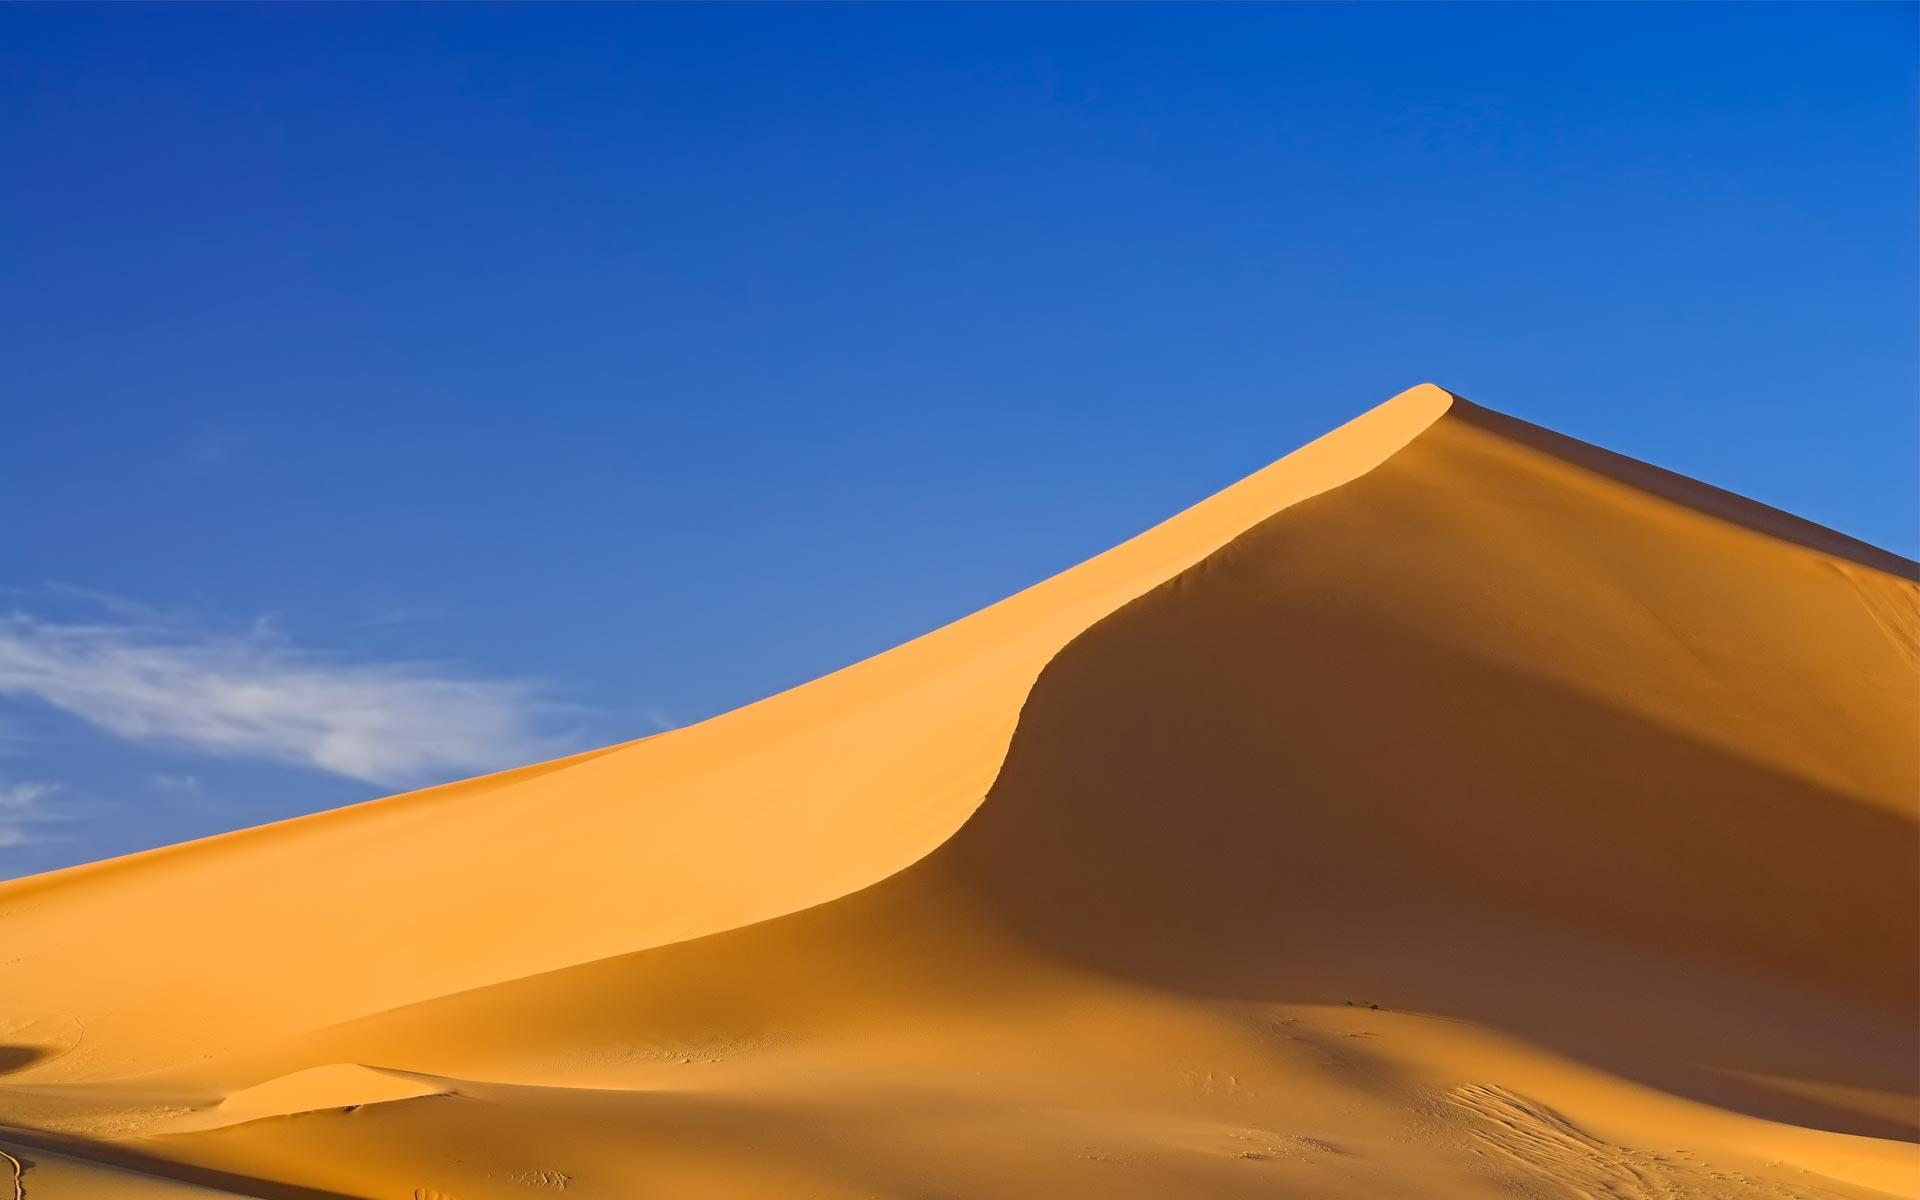 Sand Dunes Background